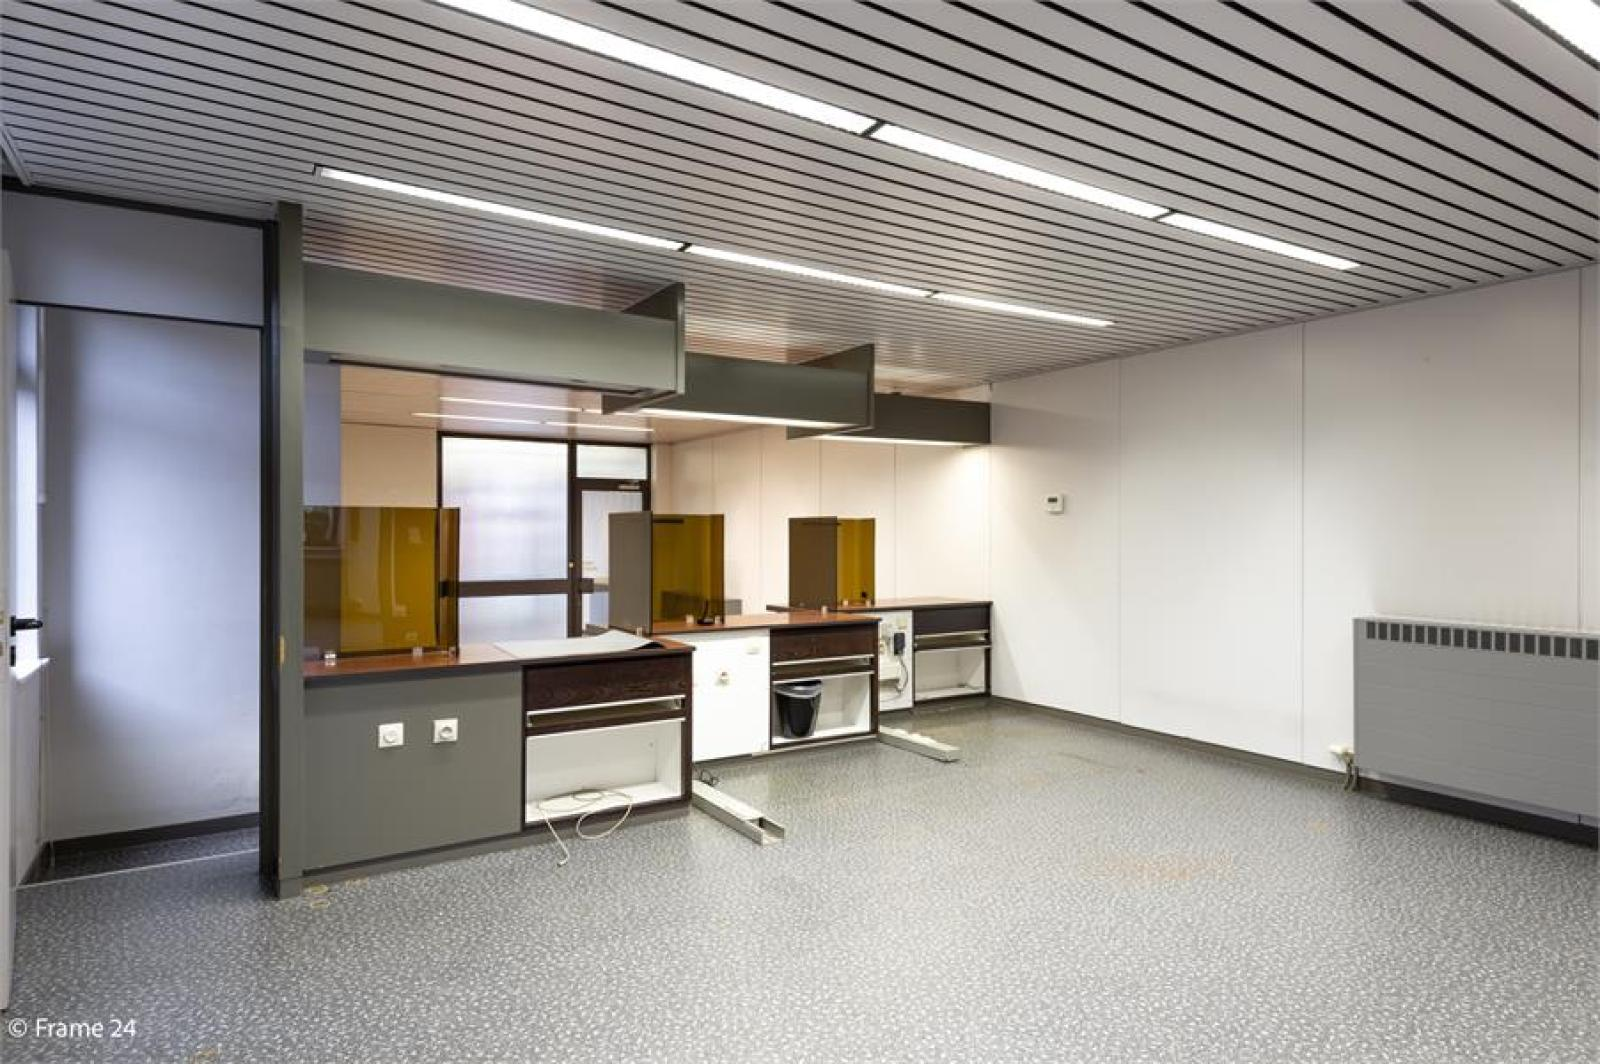 Handelsruimte met riante triplex (200 m²) op centrale ligging te Edegem! afbeelding 5